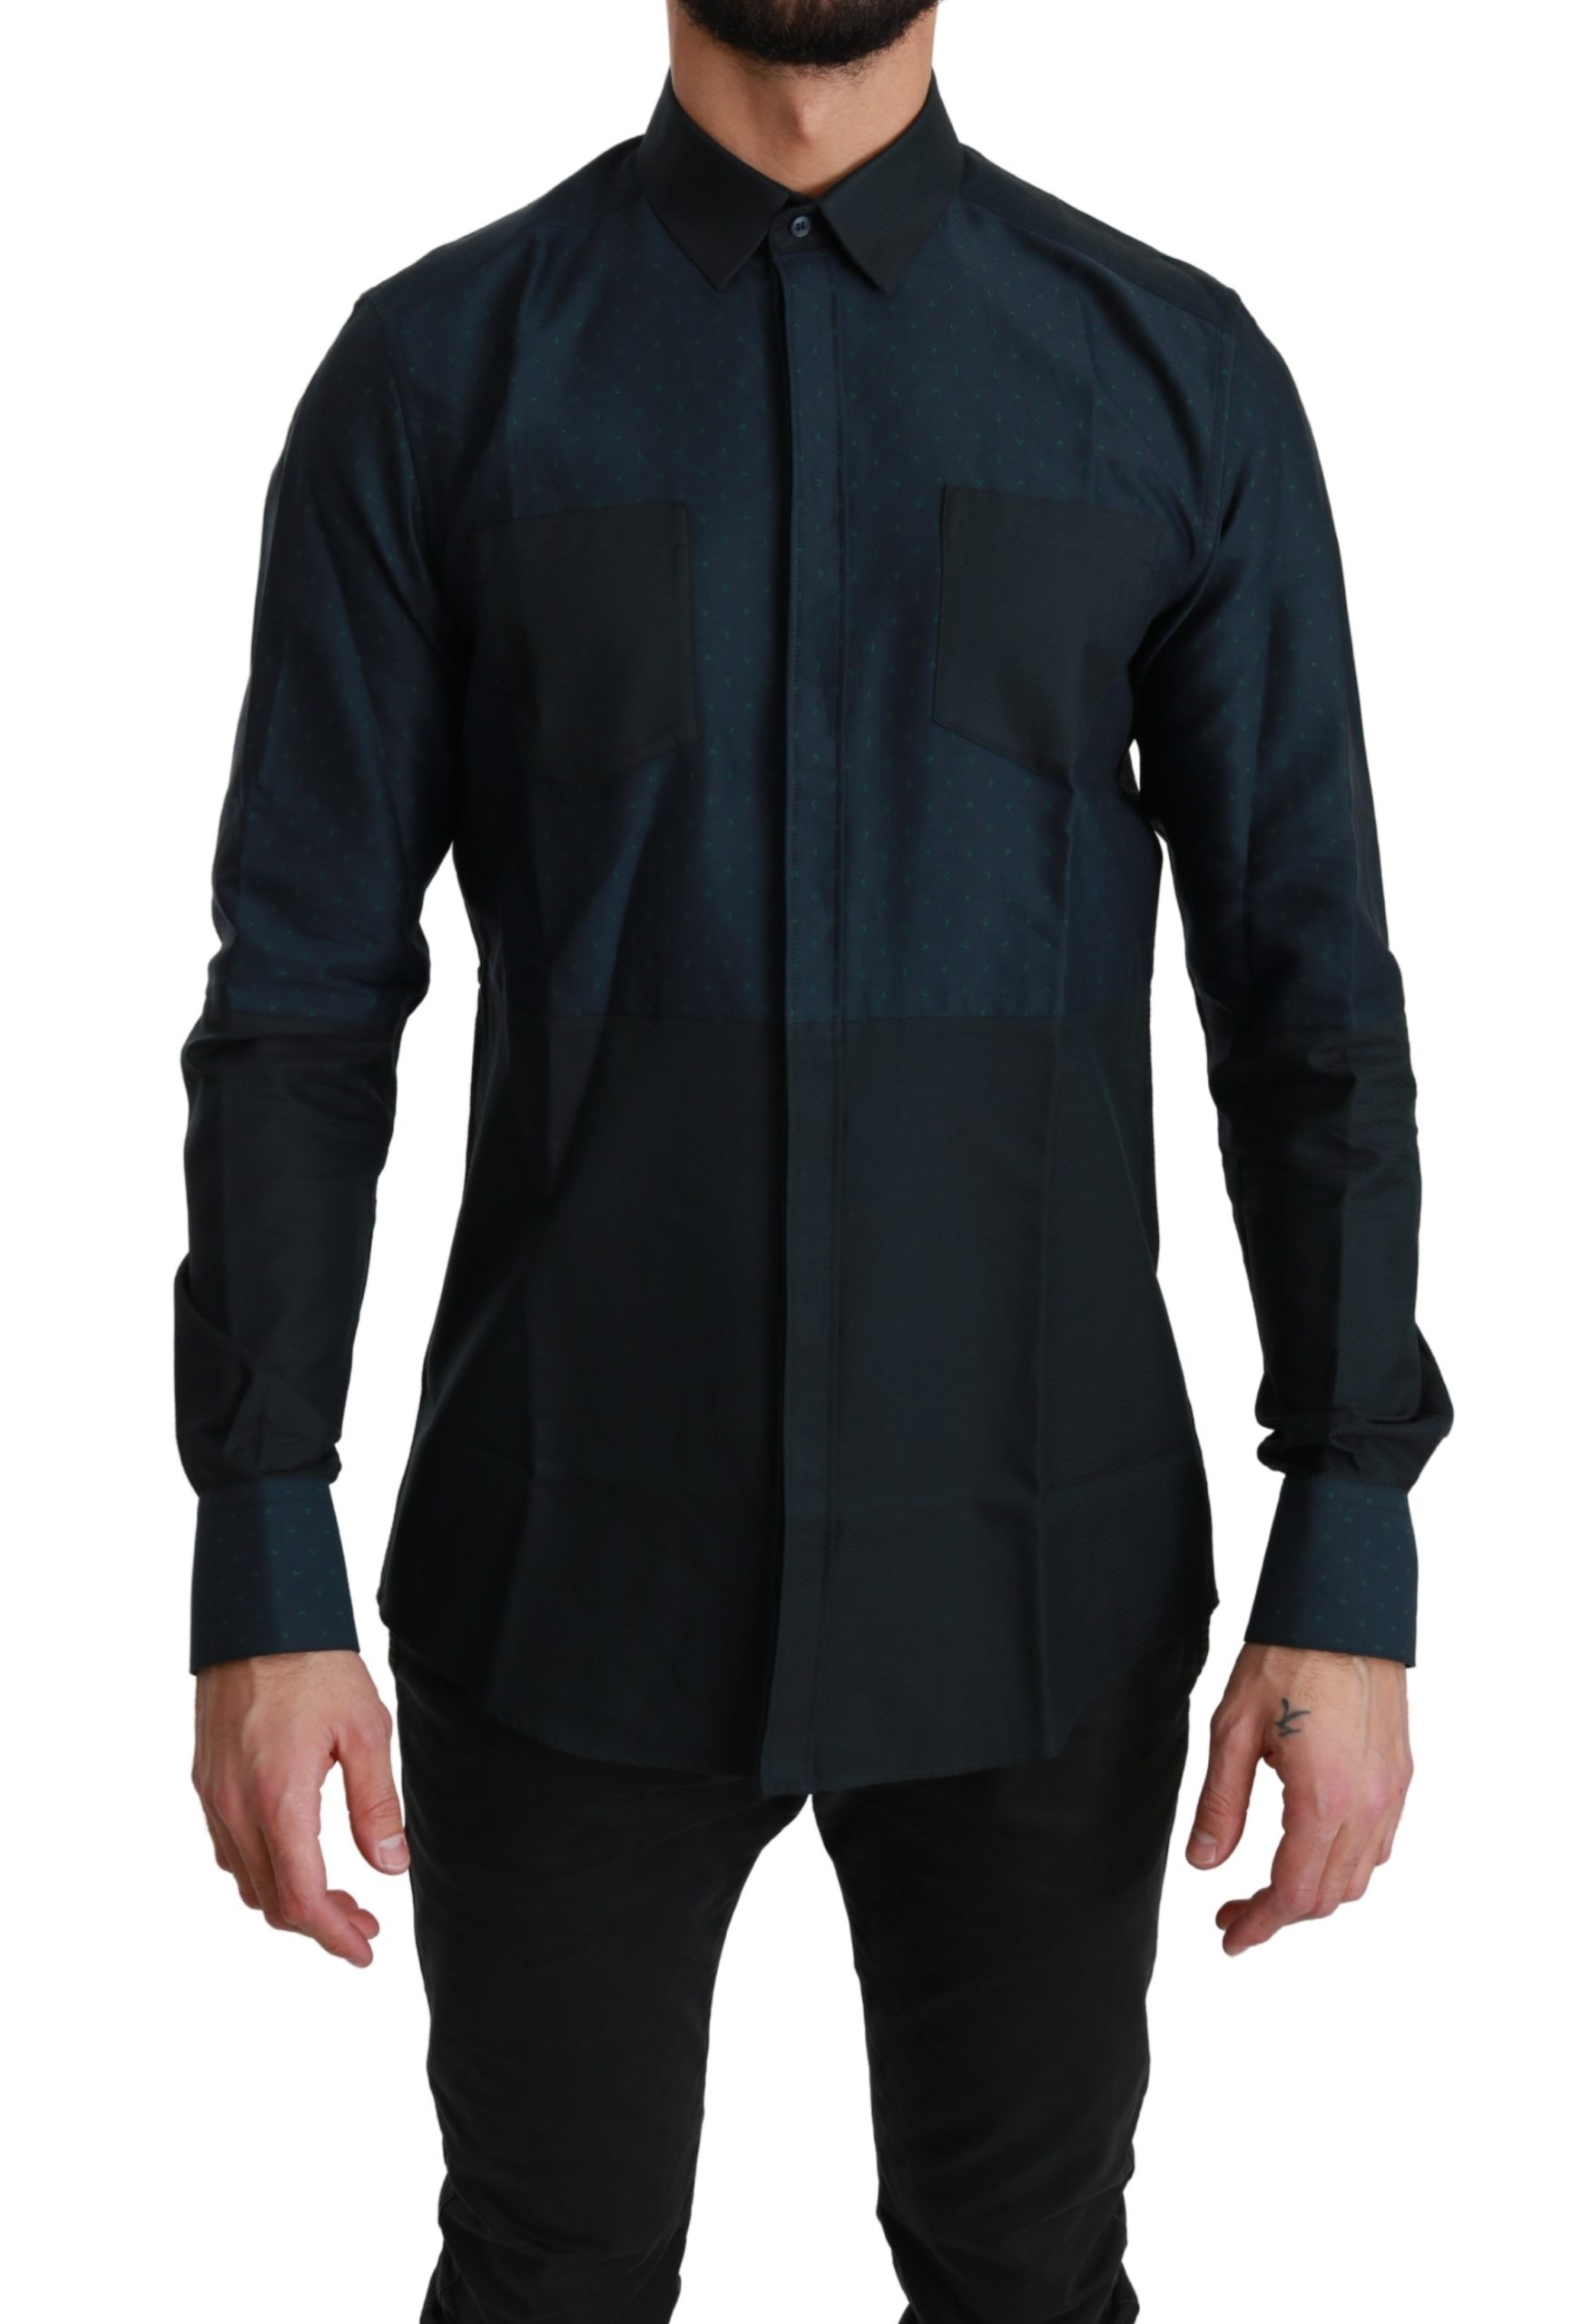 Dolce & Gabbana Men's MARTINI Dot Formal Cotton Shirt Black TSH4506 - IT39 | S